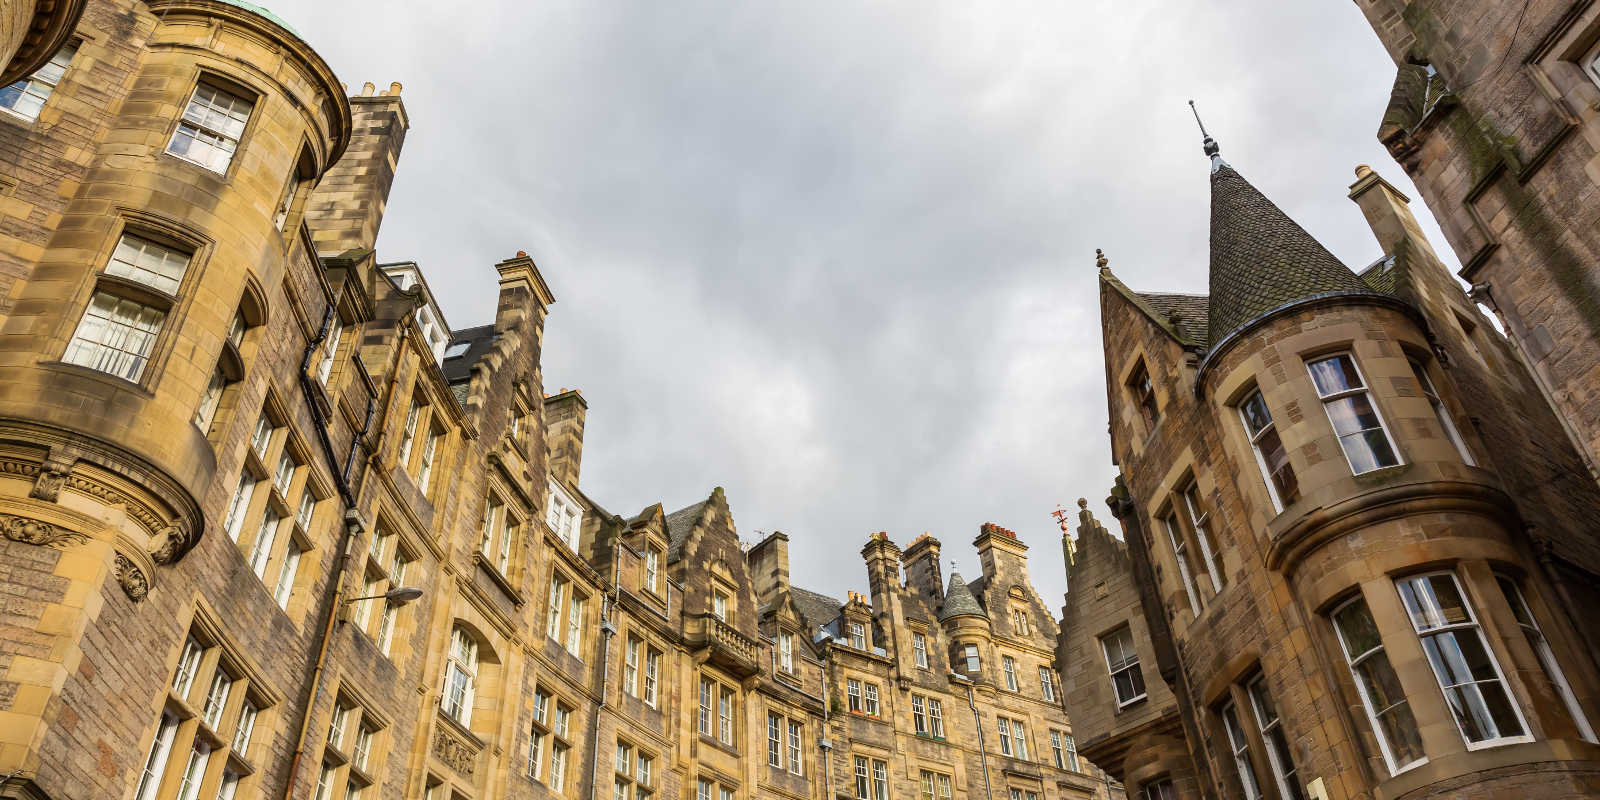 Tops of buildings on Cockburn Street in Edinburgh